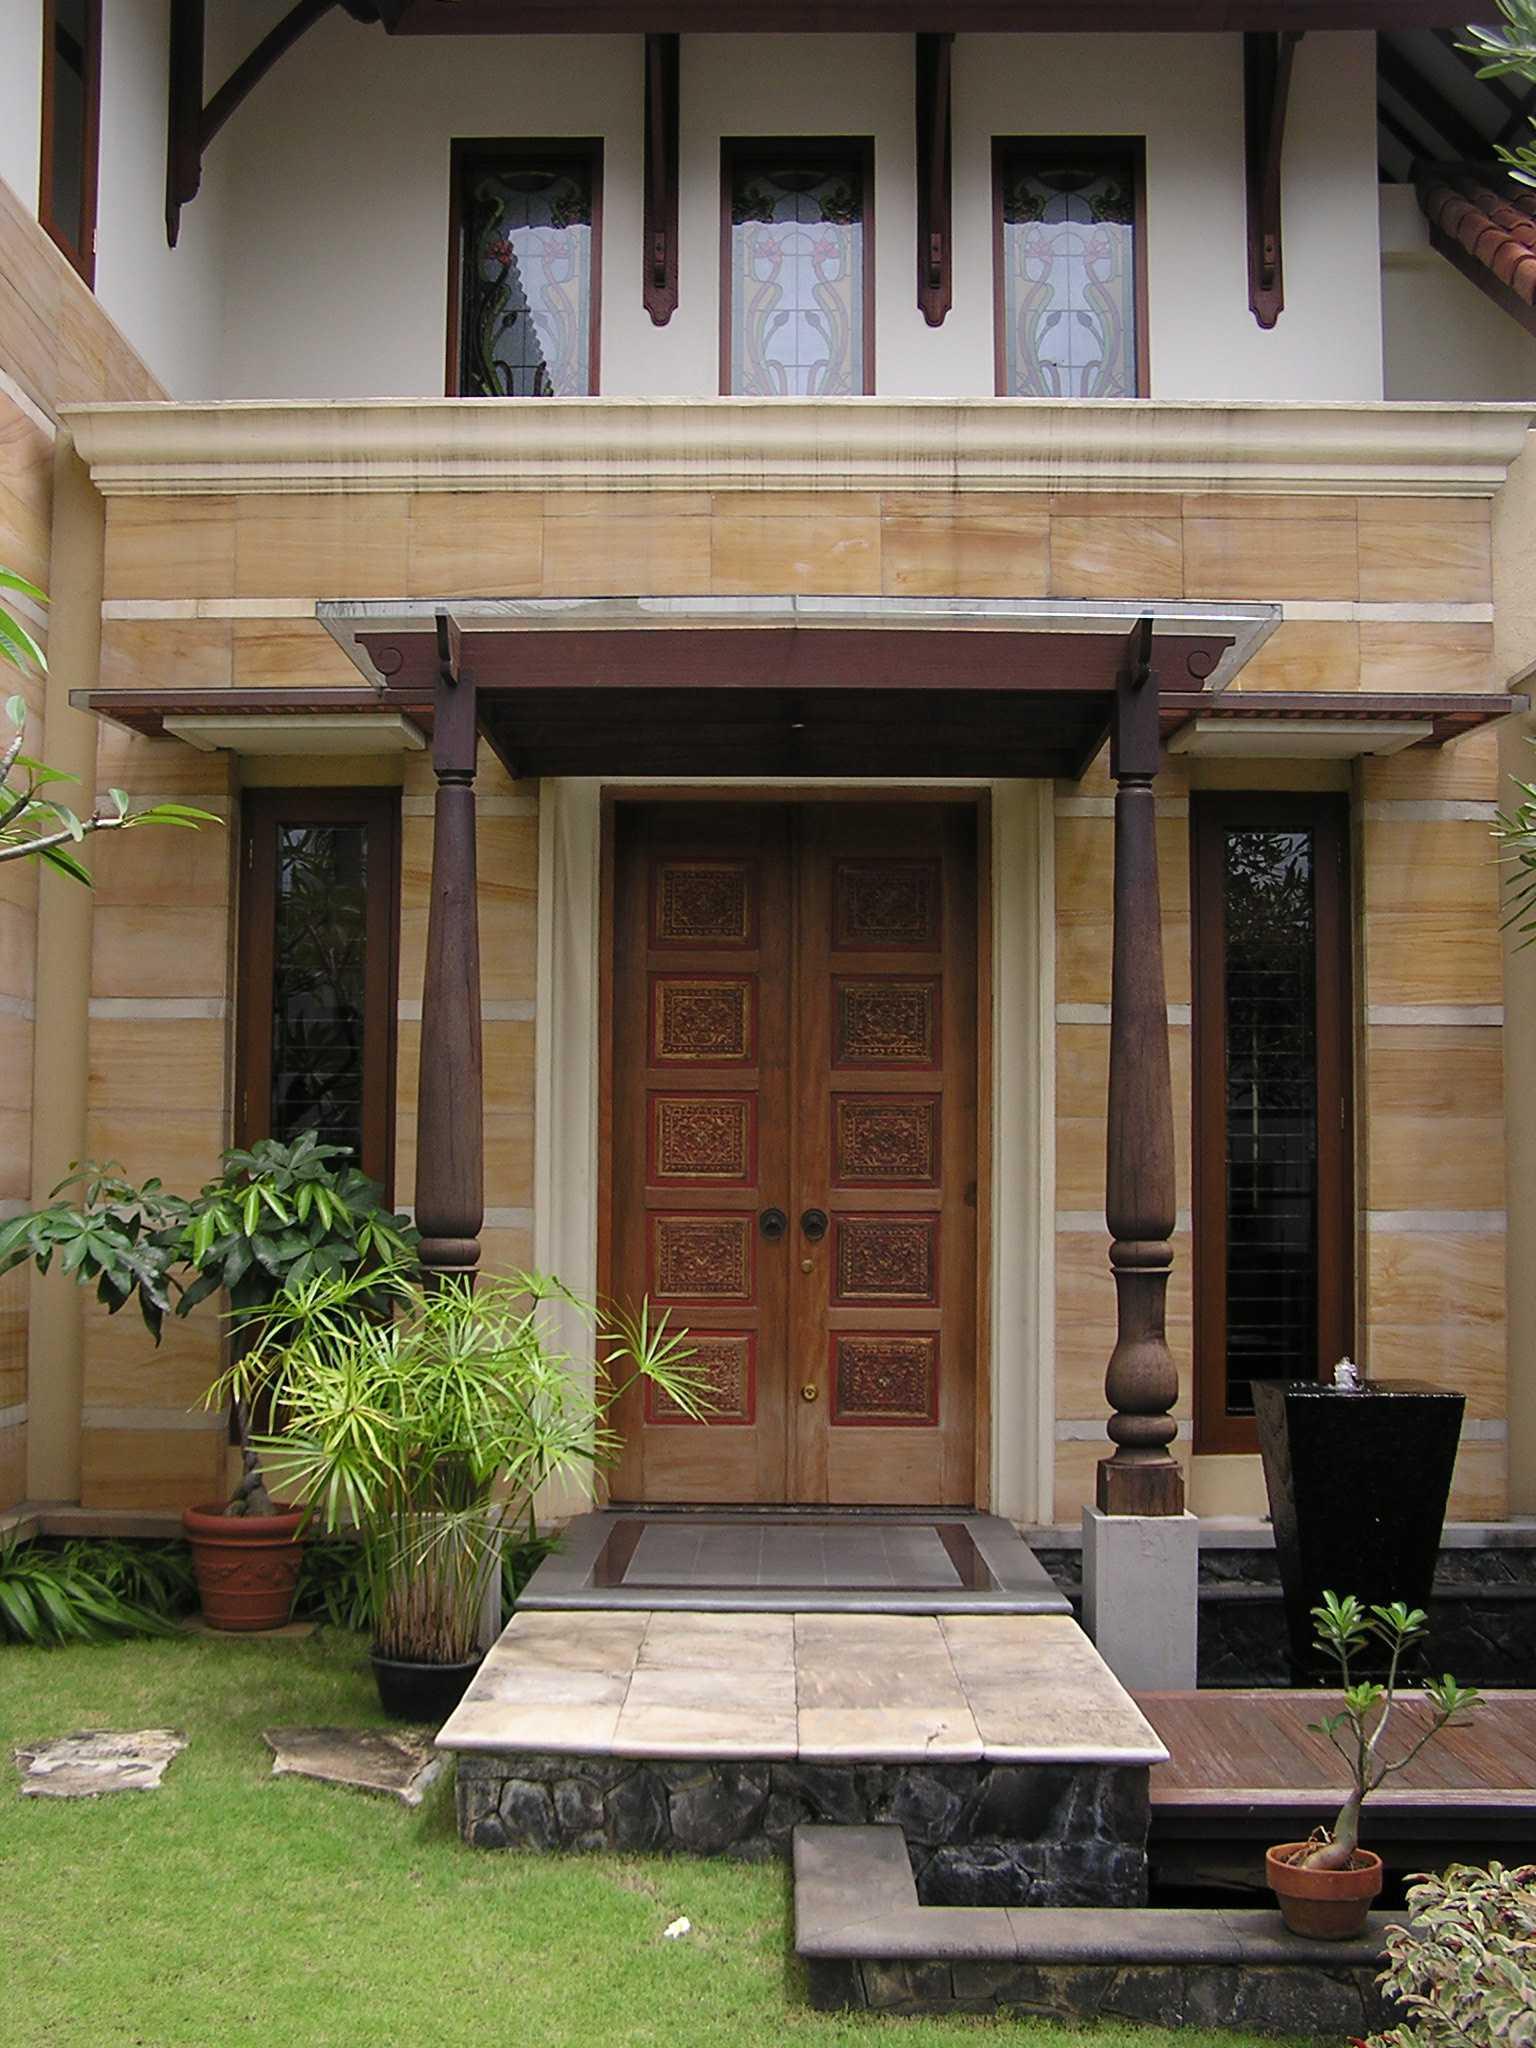 Pt. Garisprada Permata Hijau Residence Rt.4/rw.2, Grogol Utara, Kby. Lama, Kota Jakarta Selatan, Daerah Khusus Ibukota Jakarta 12210, Indonesia Permata Hijau Front Door Tradisional  22362